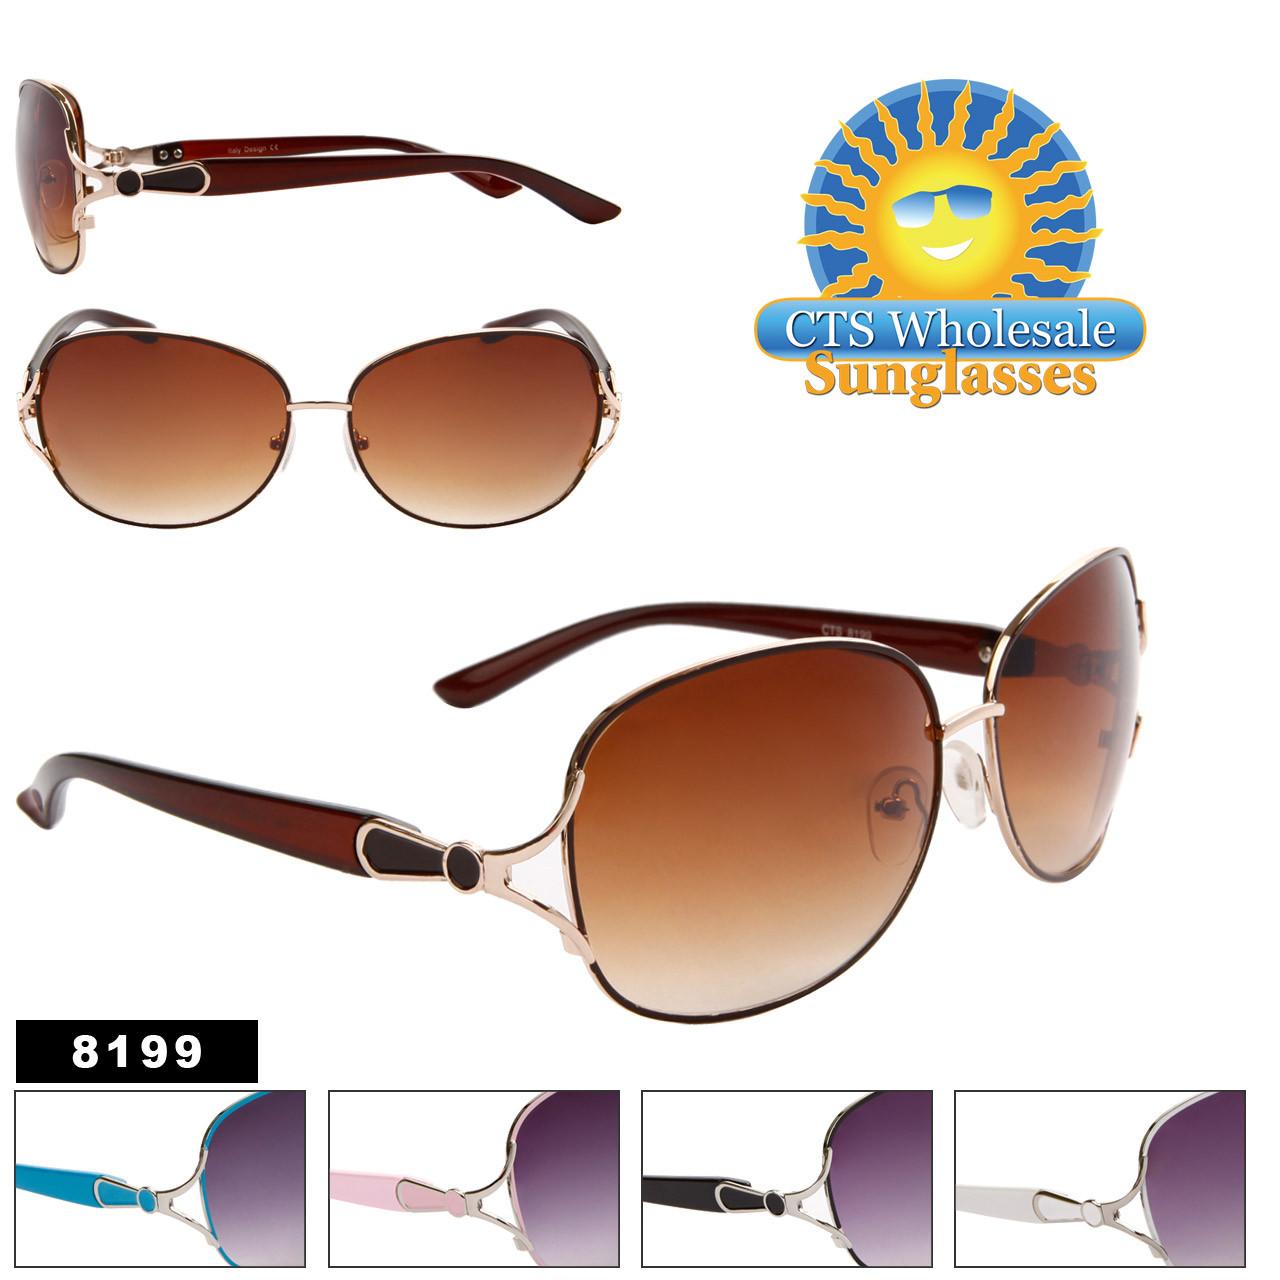 Wholesale Women's Designer Sunglasses - 8199